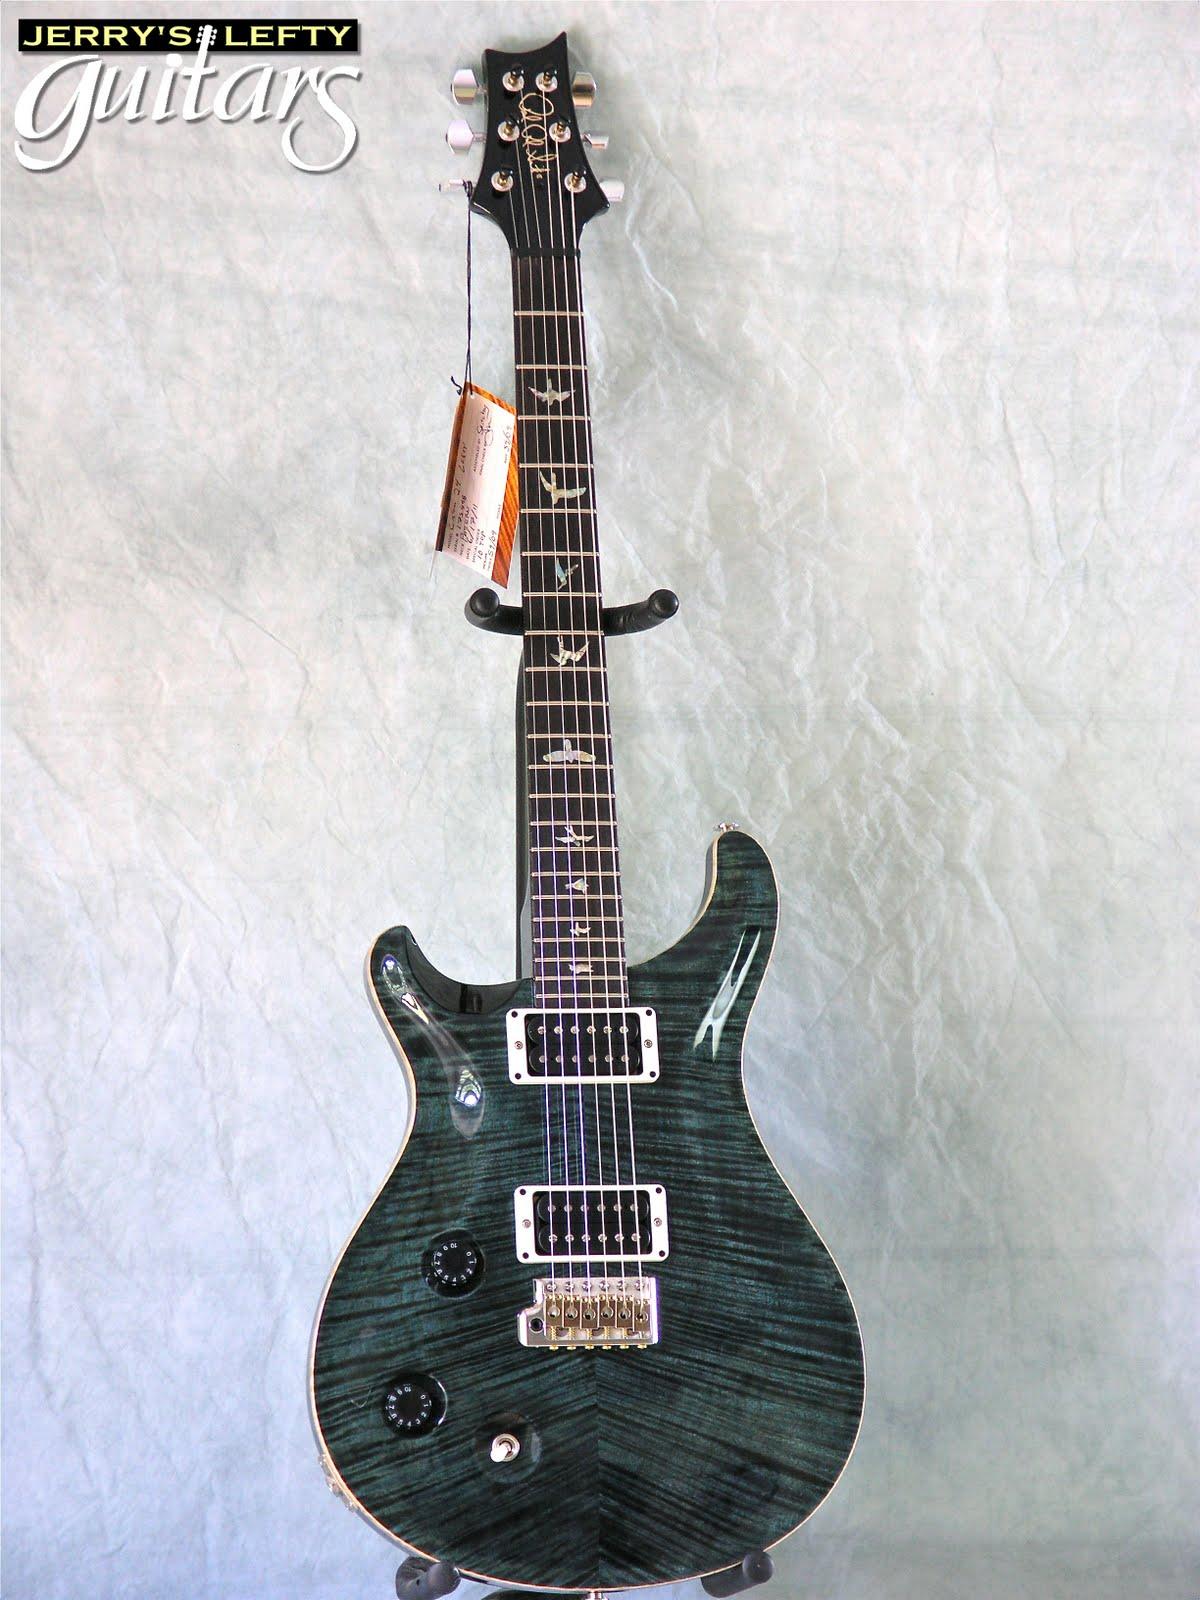 jerry 39 s lefty guitars newest guitar arrivals updated weekly prs custom 22 black slate left. Black Bedroom Furniture Sets. Home Design Ideas